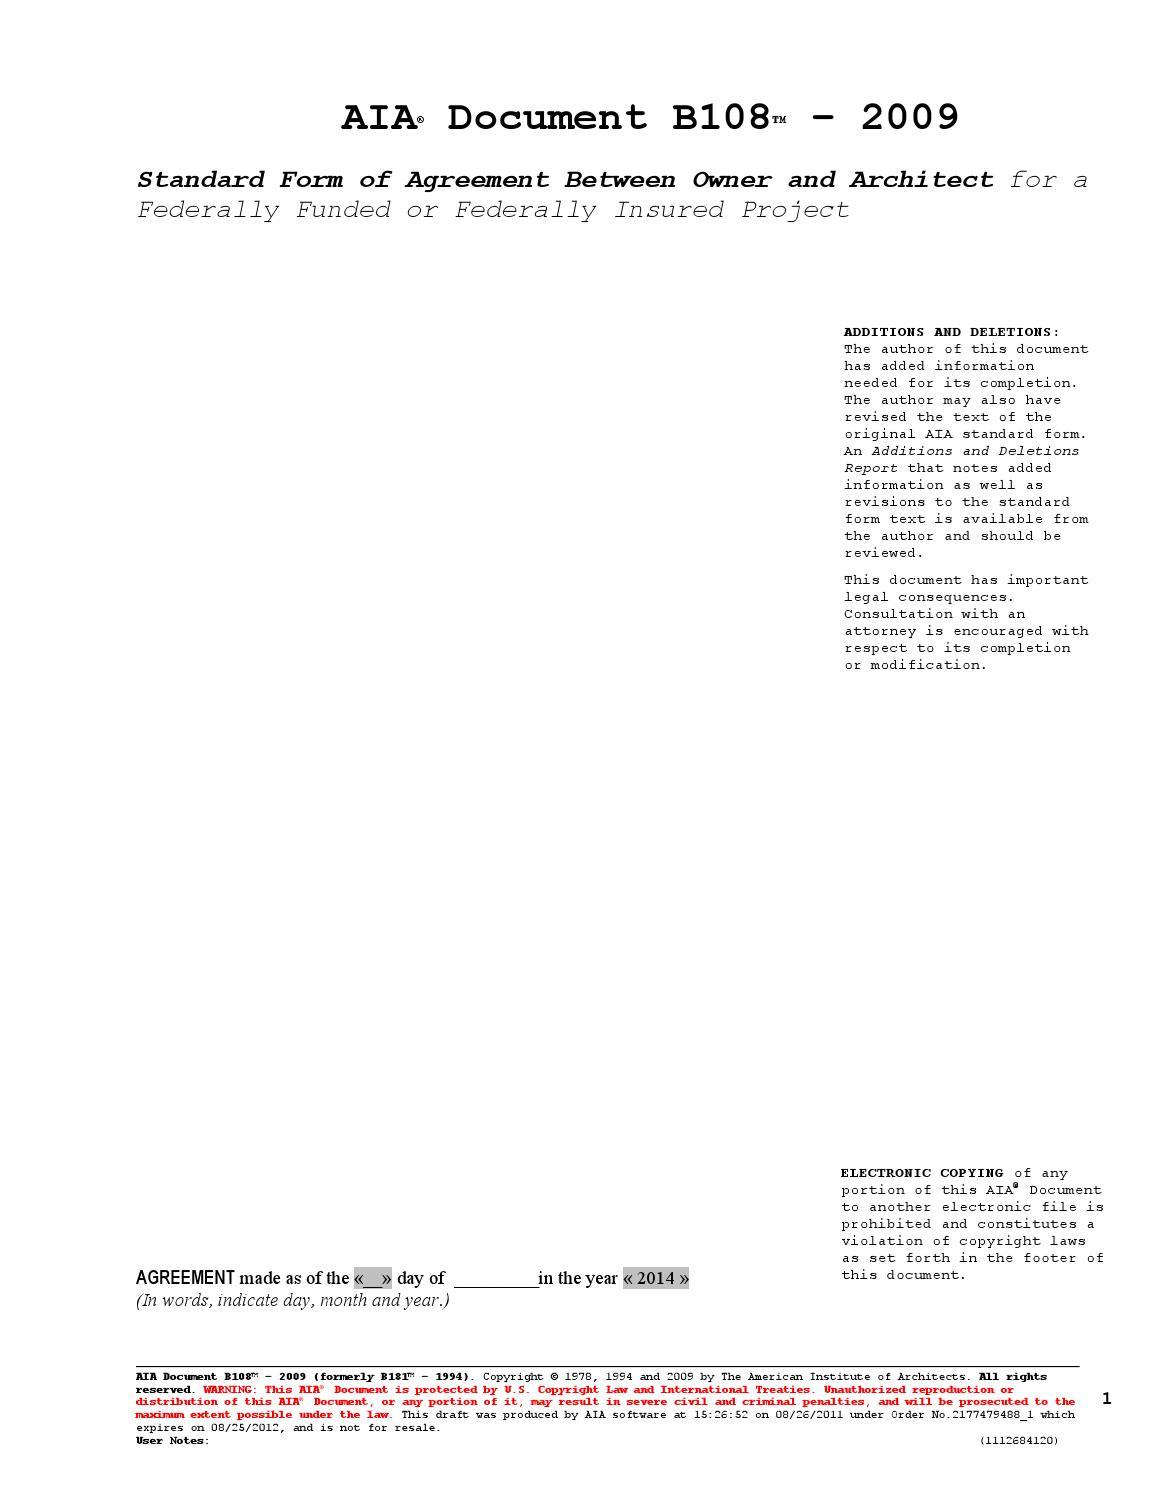 Pine Lake Mv Dwell Architect Draft Aia Contract B108 By Pine Lake